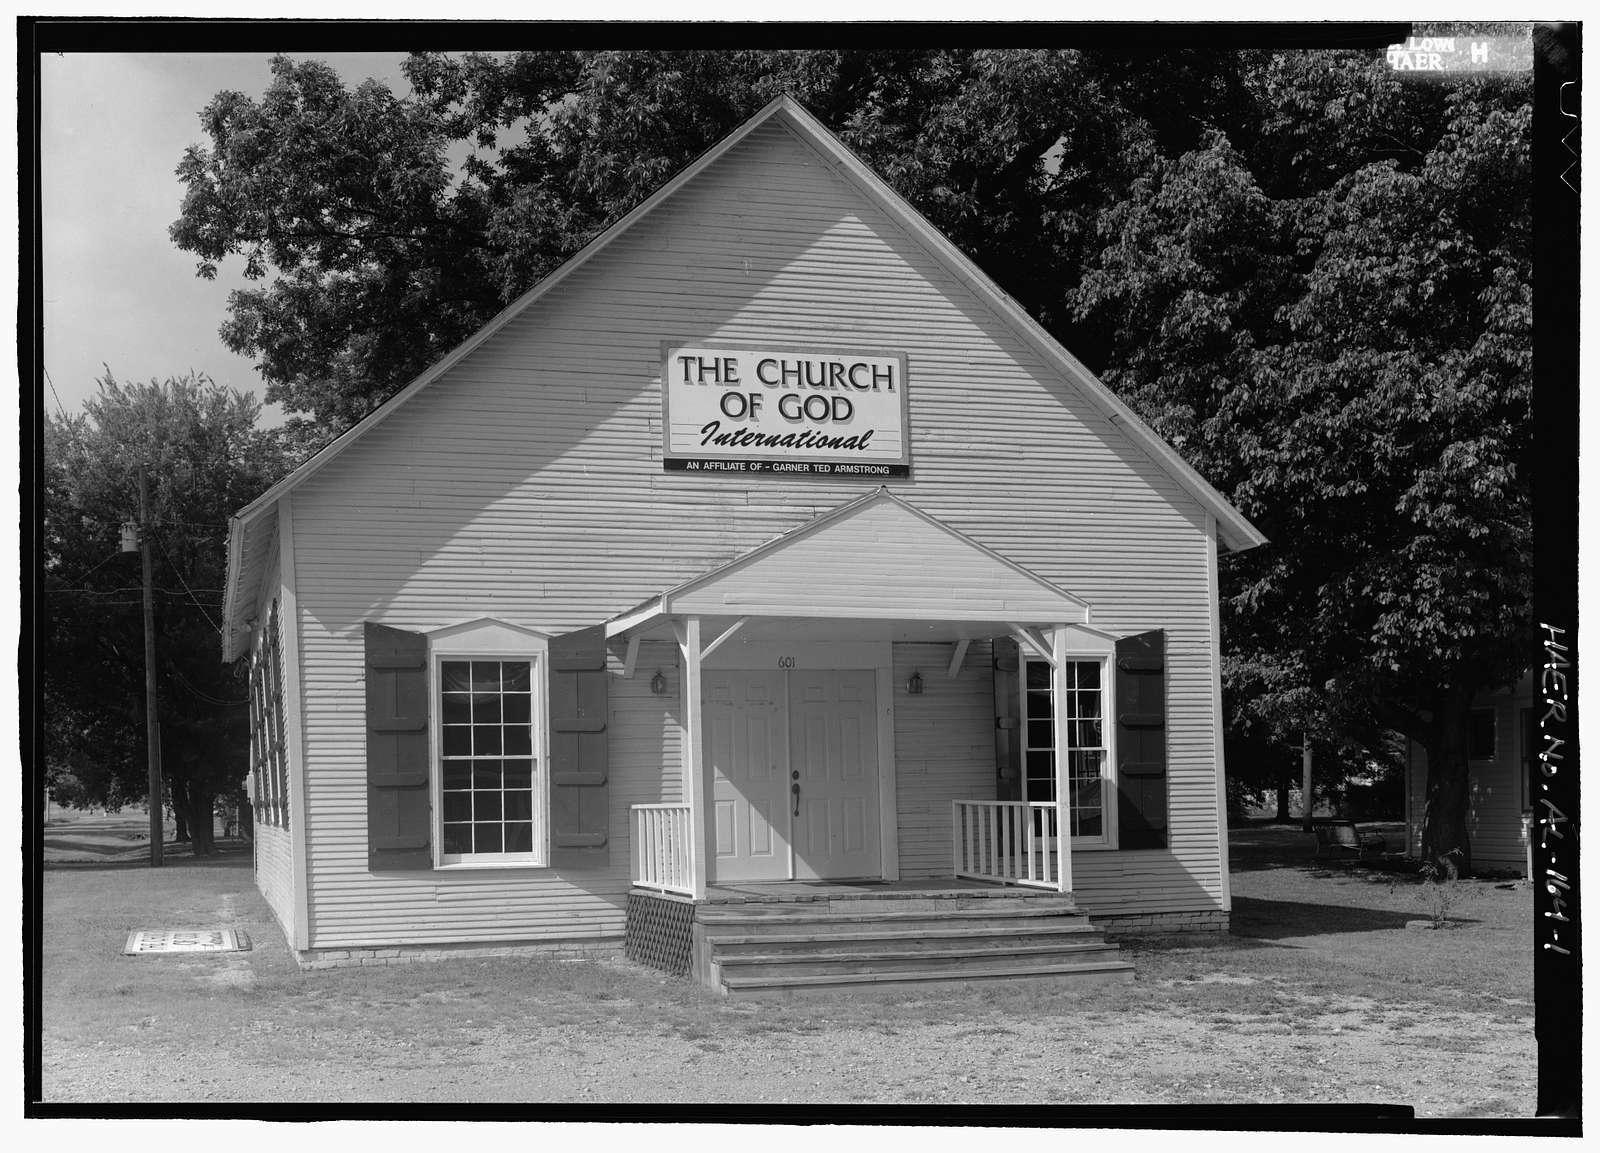 601 Humes Avenue (House), 601 Humes Avenue, Huntsville, Madison County, AL